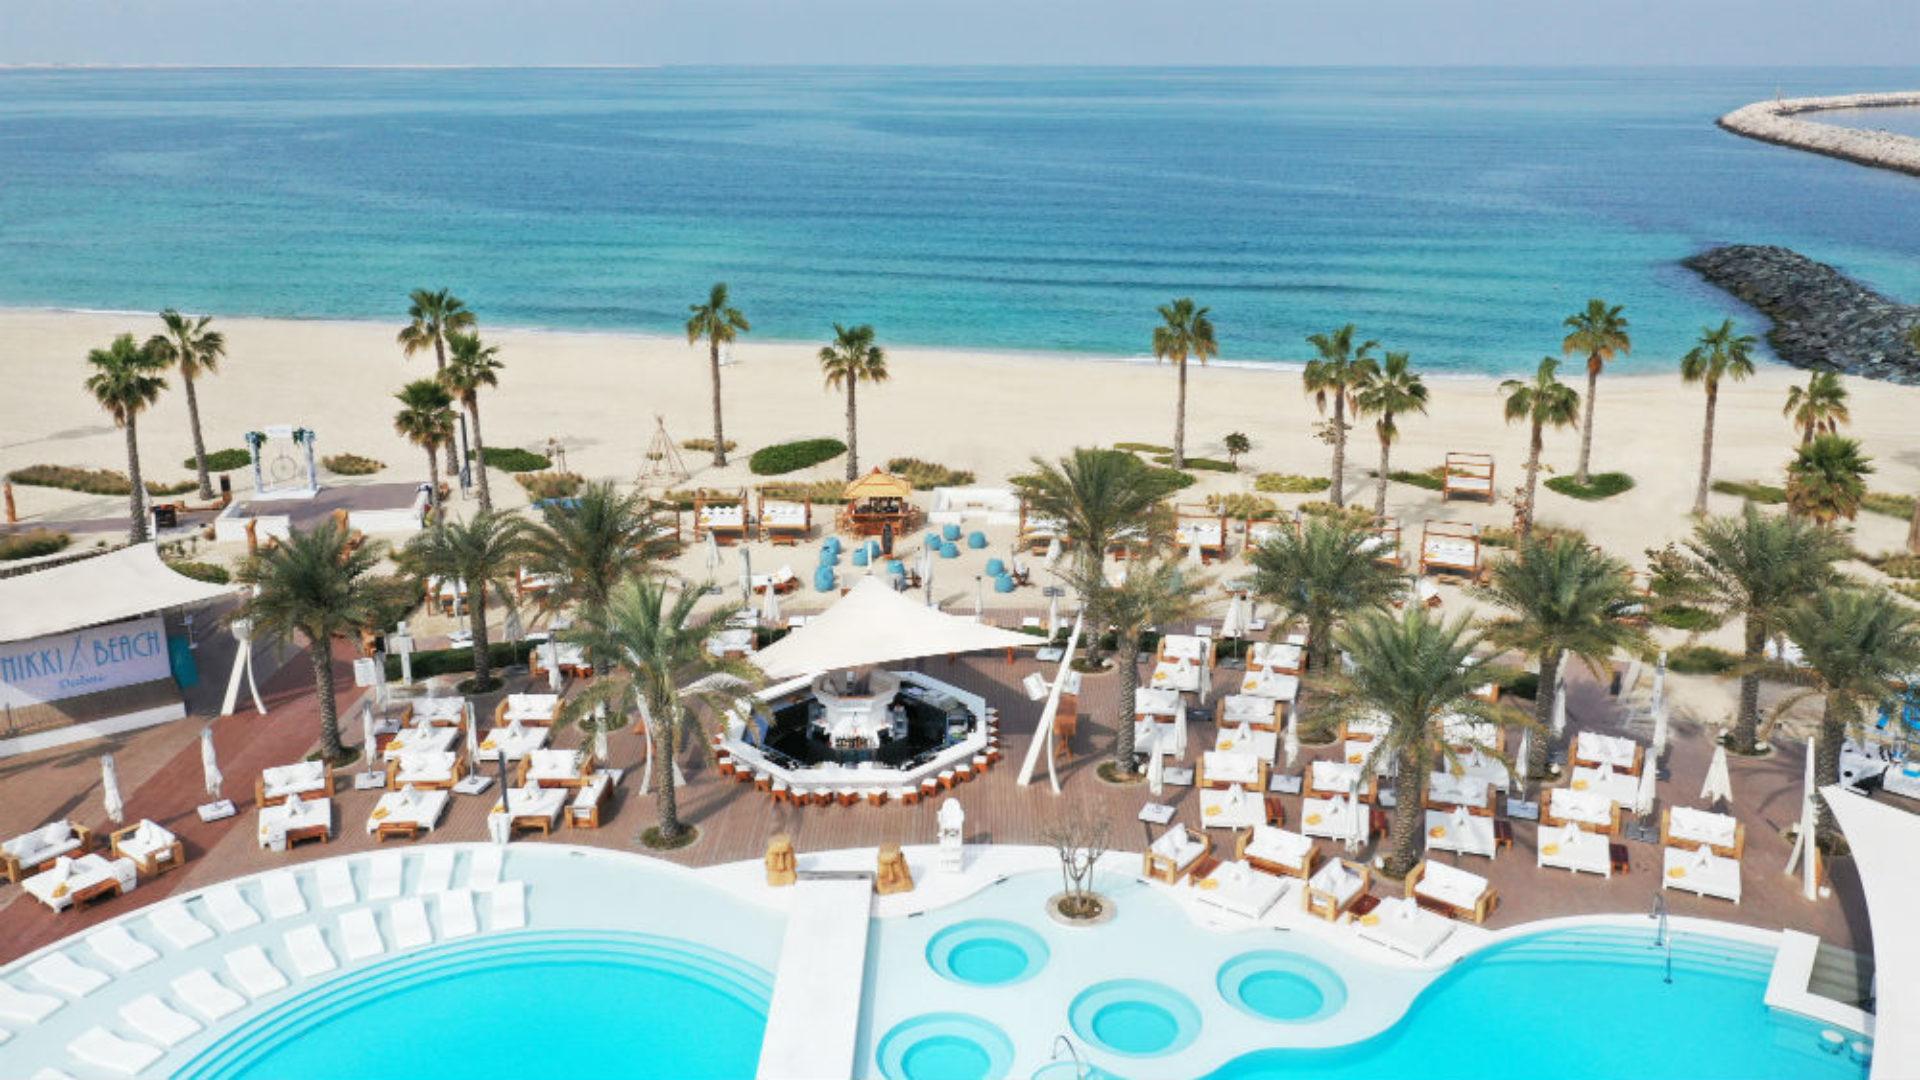 Aerial view of the pool & beach at the Beach Club at Nikki Beach Resort & Spa